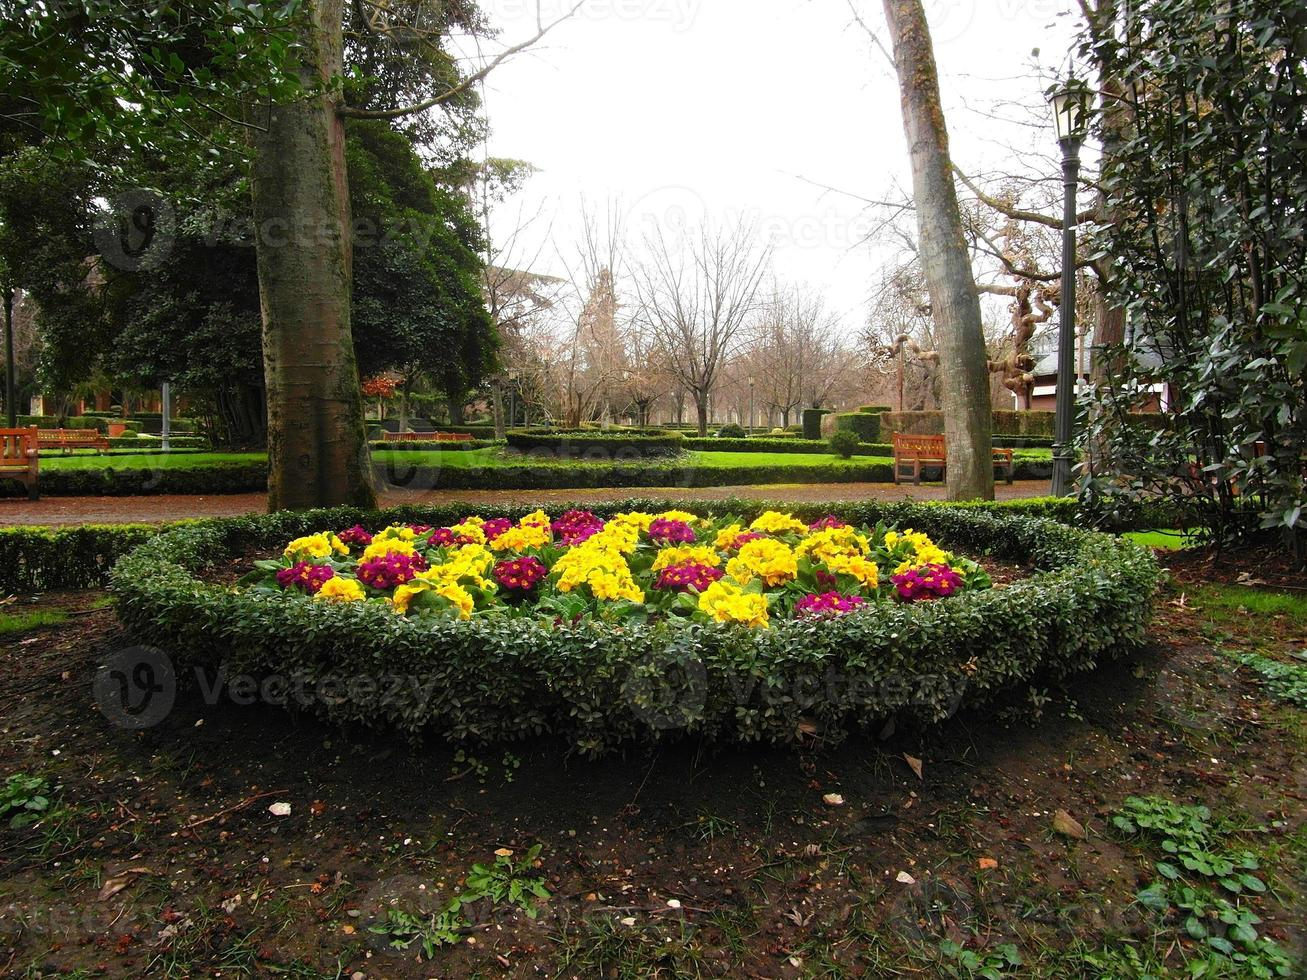 andar no parque perto das flores foto